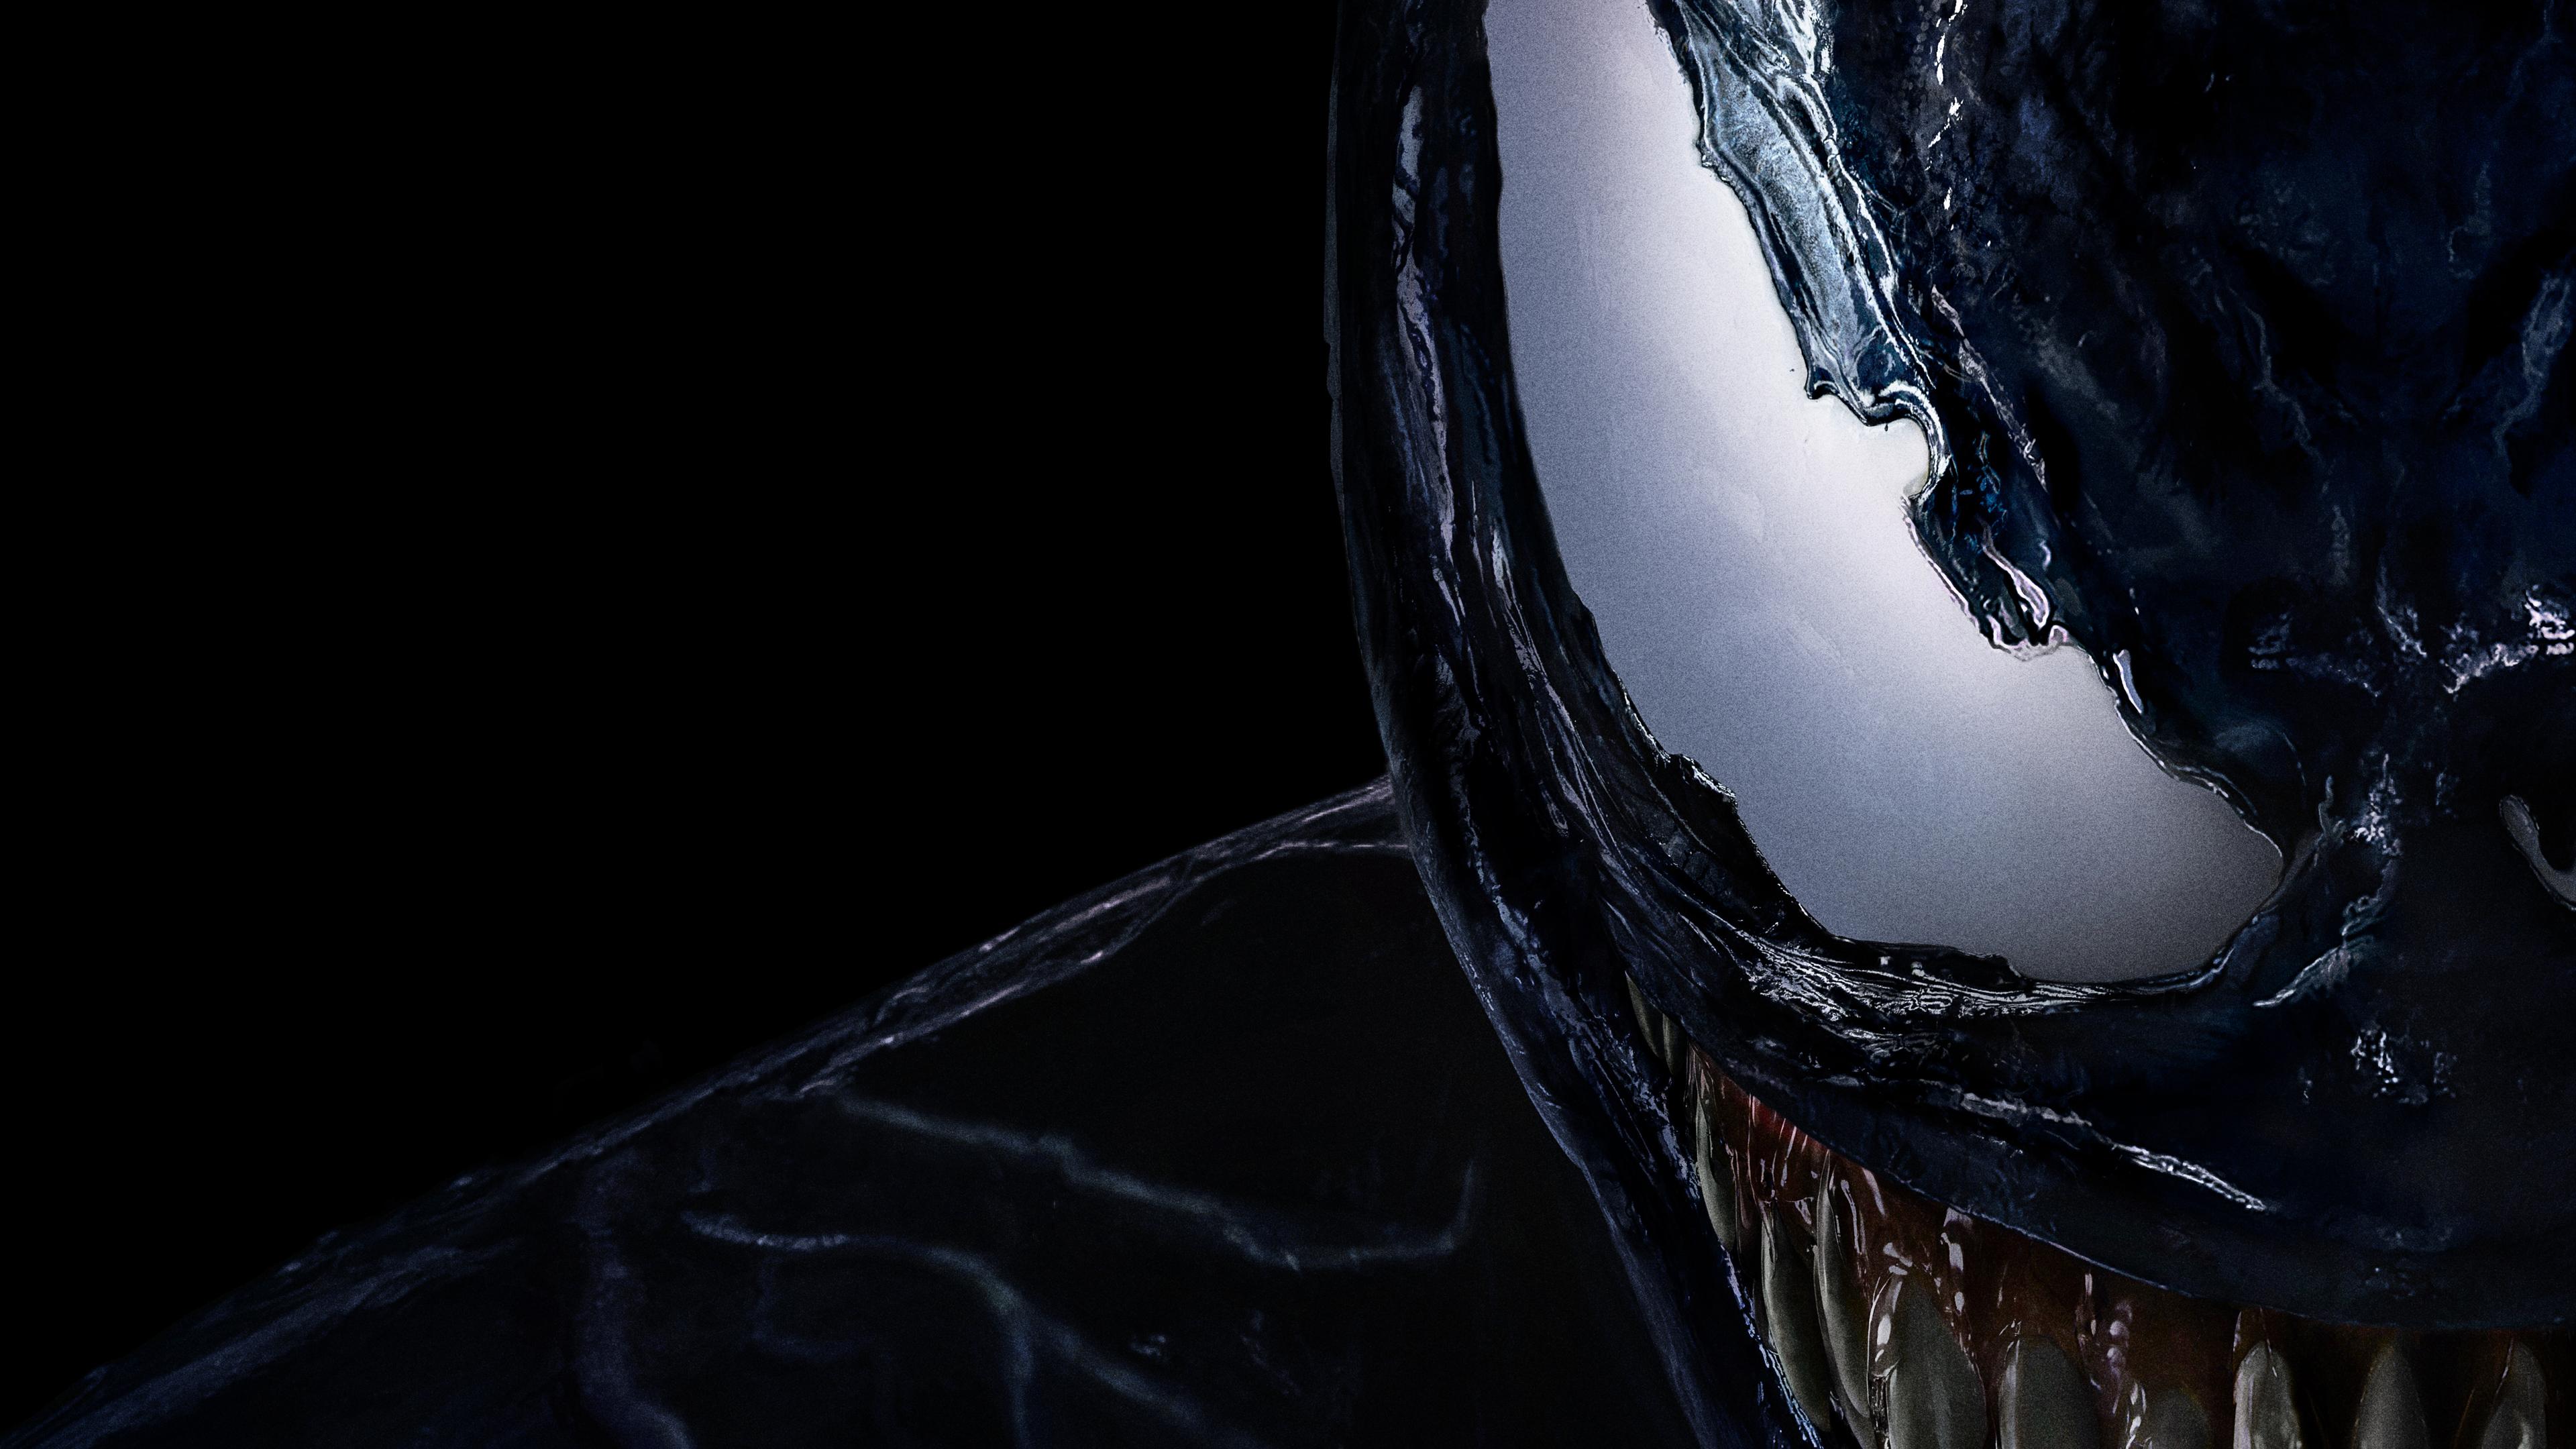 Wallpaper 4k Venom Movie Official Poster 8k 2018 Movies Wallpapers